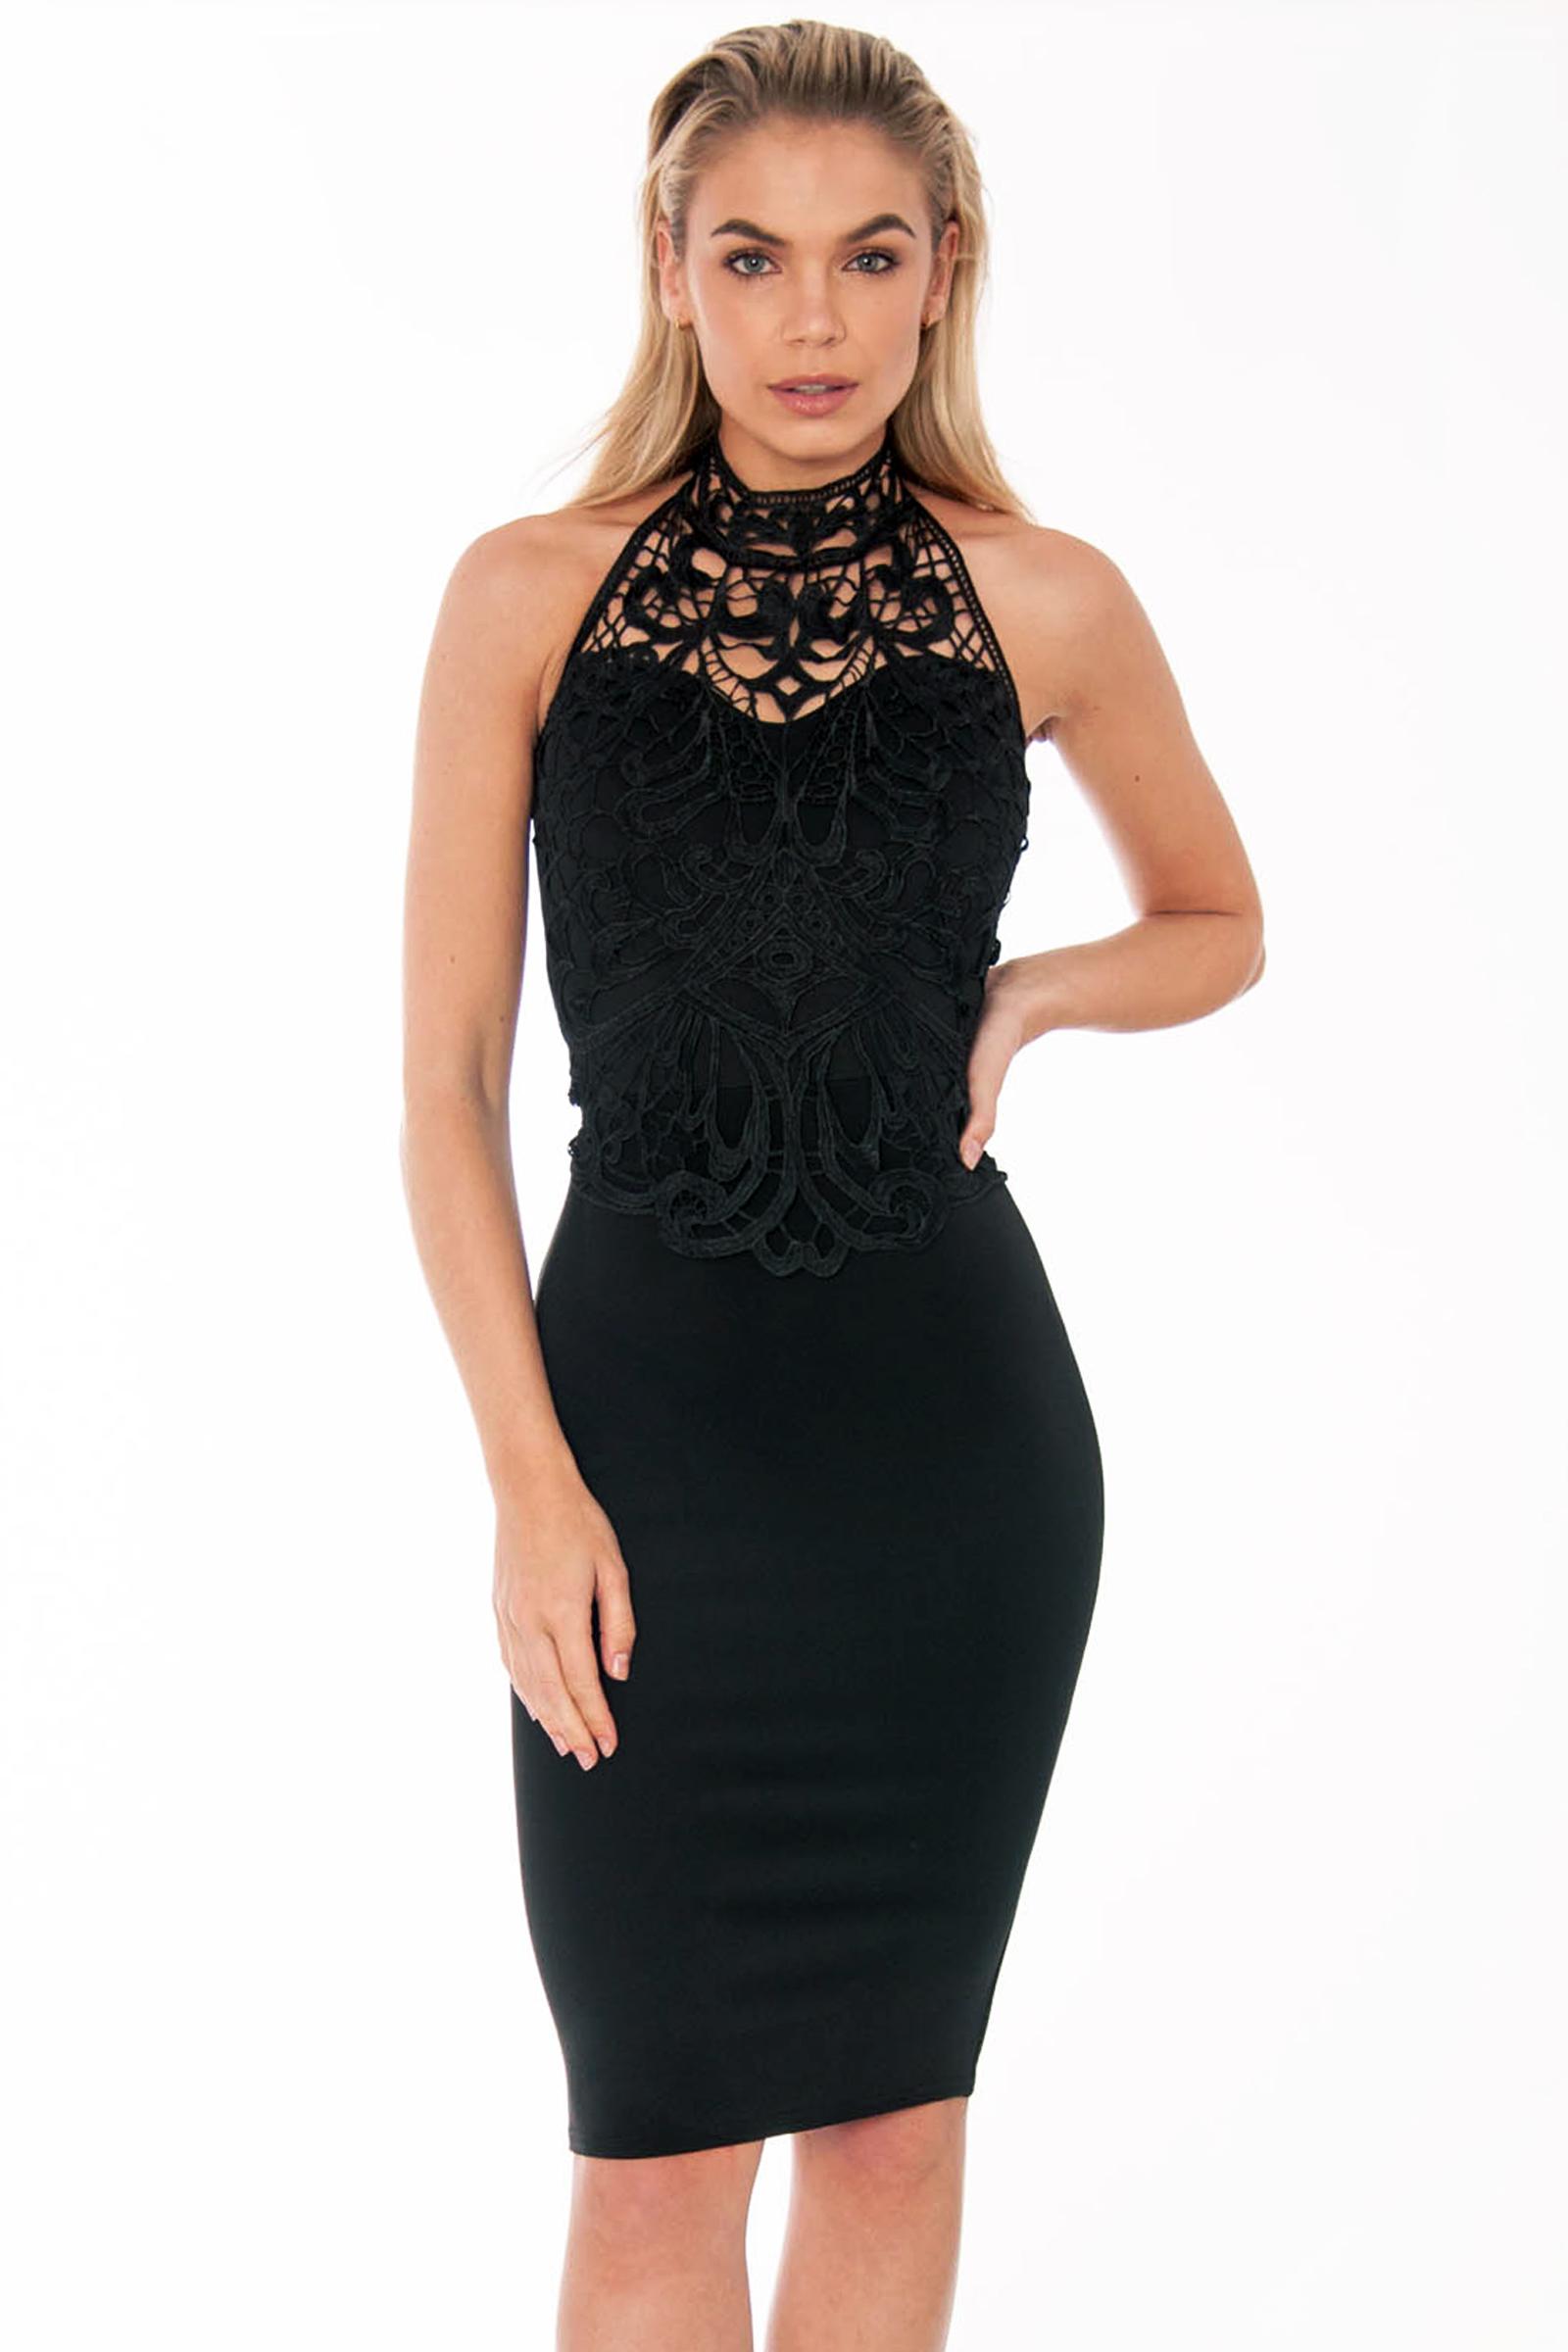 Black halter neck dress uk